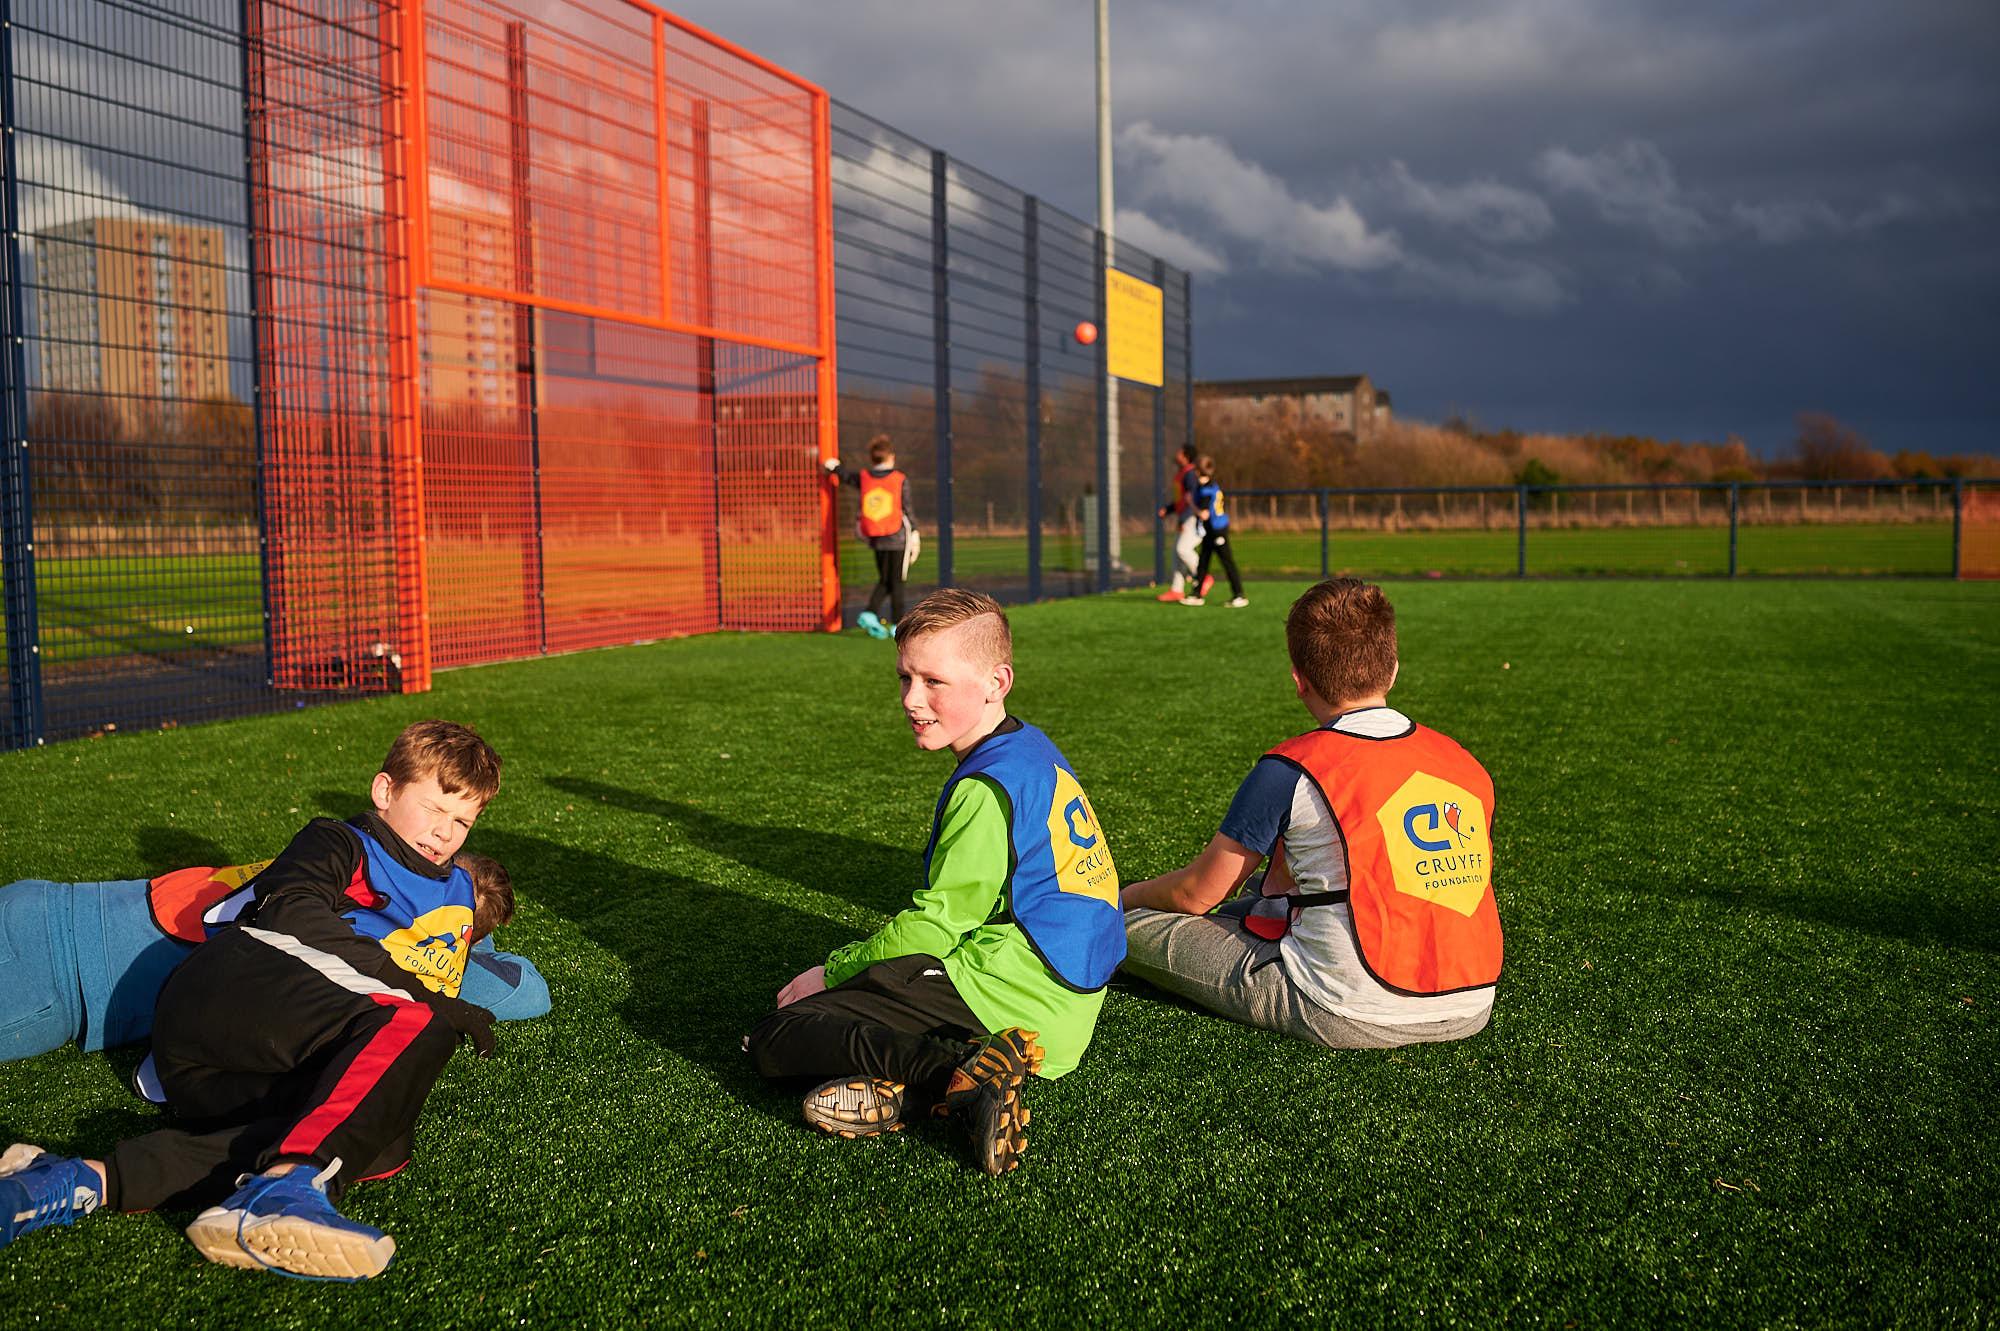 Kids relaxing on a Cruyff Court in Aberdeen